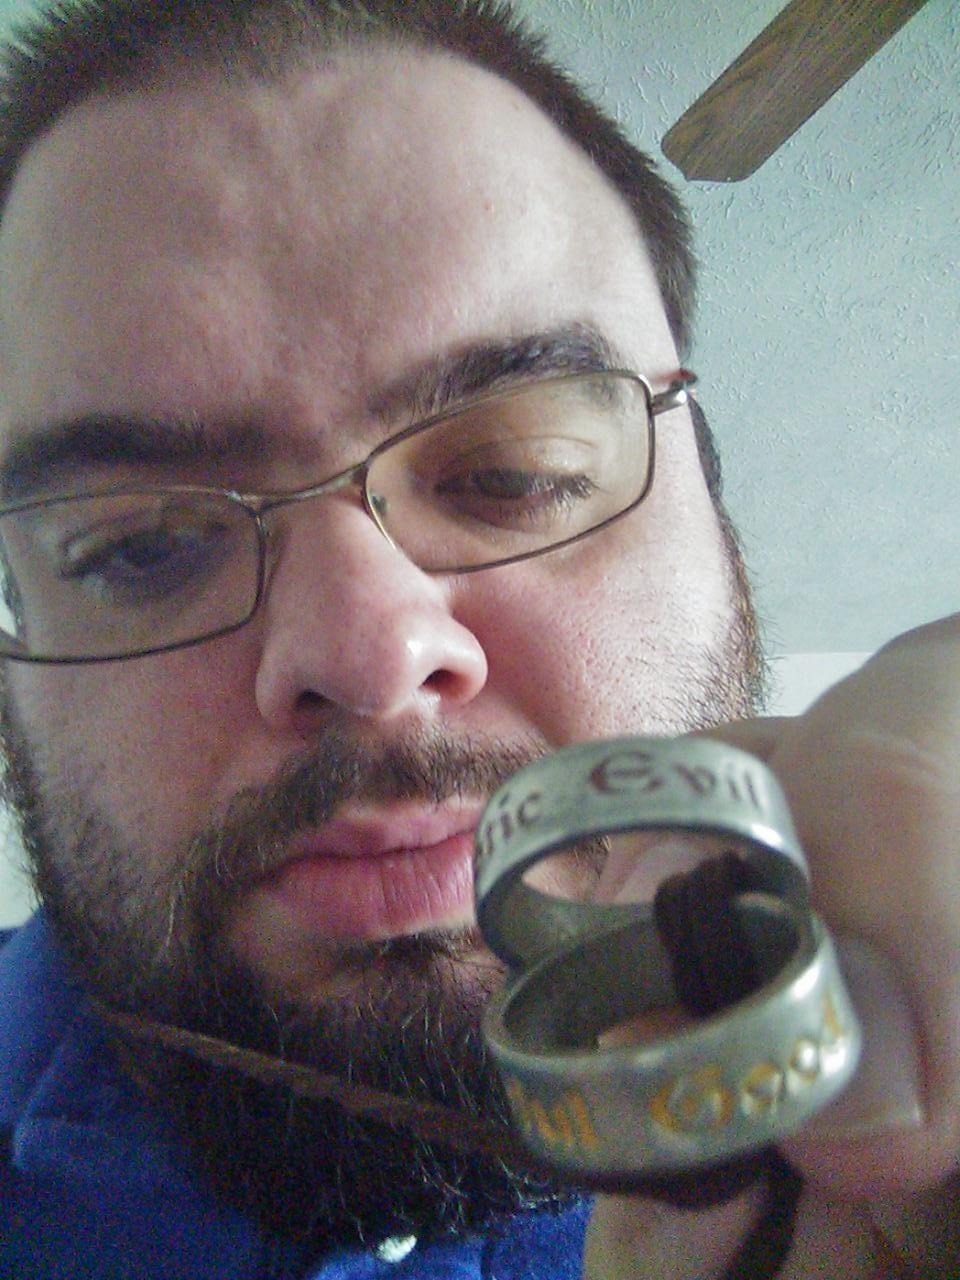 ByTrevorOsz Editor-In-Chief forSpiderduck Network Follow on Twitter@TrevorOsz